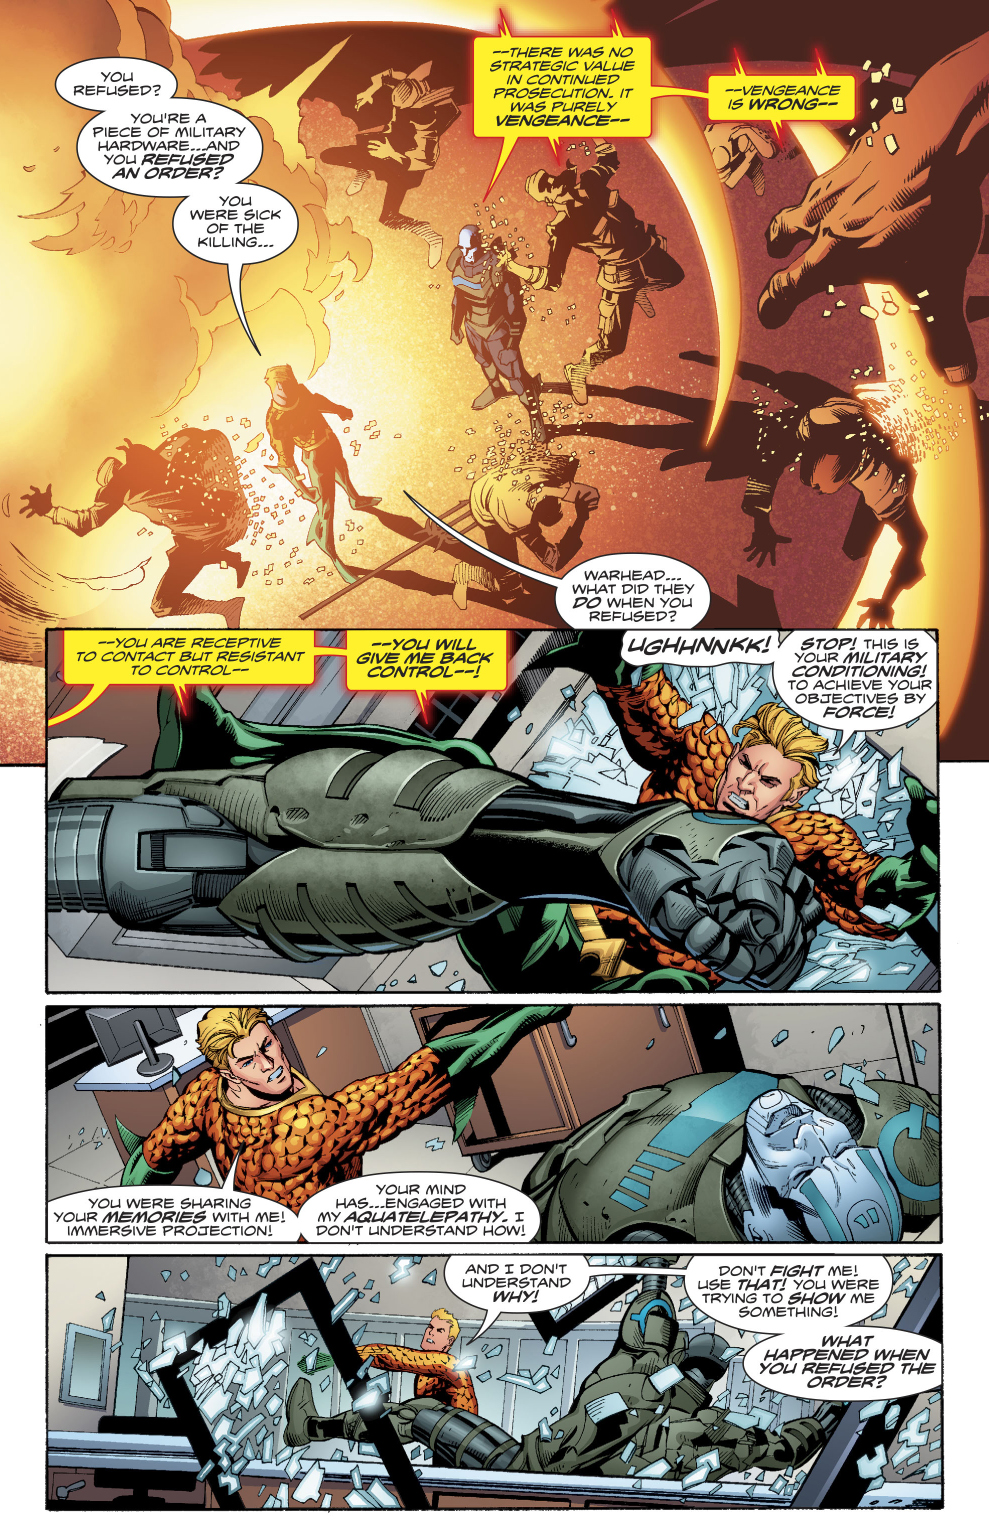 Aquaman Learns Warheads Background Story Comicnewbies 989x1520